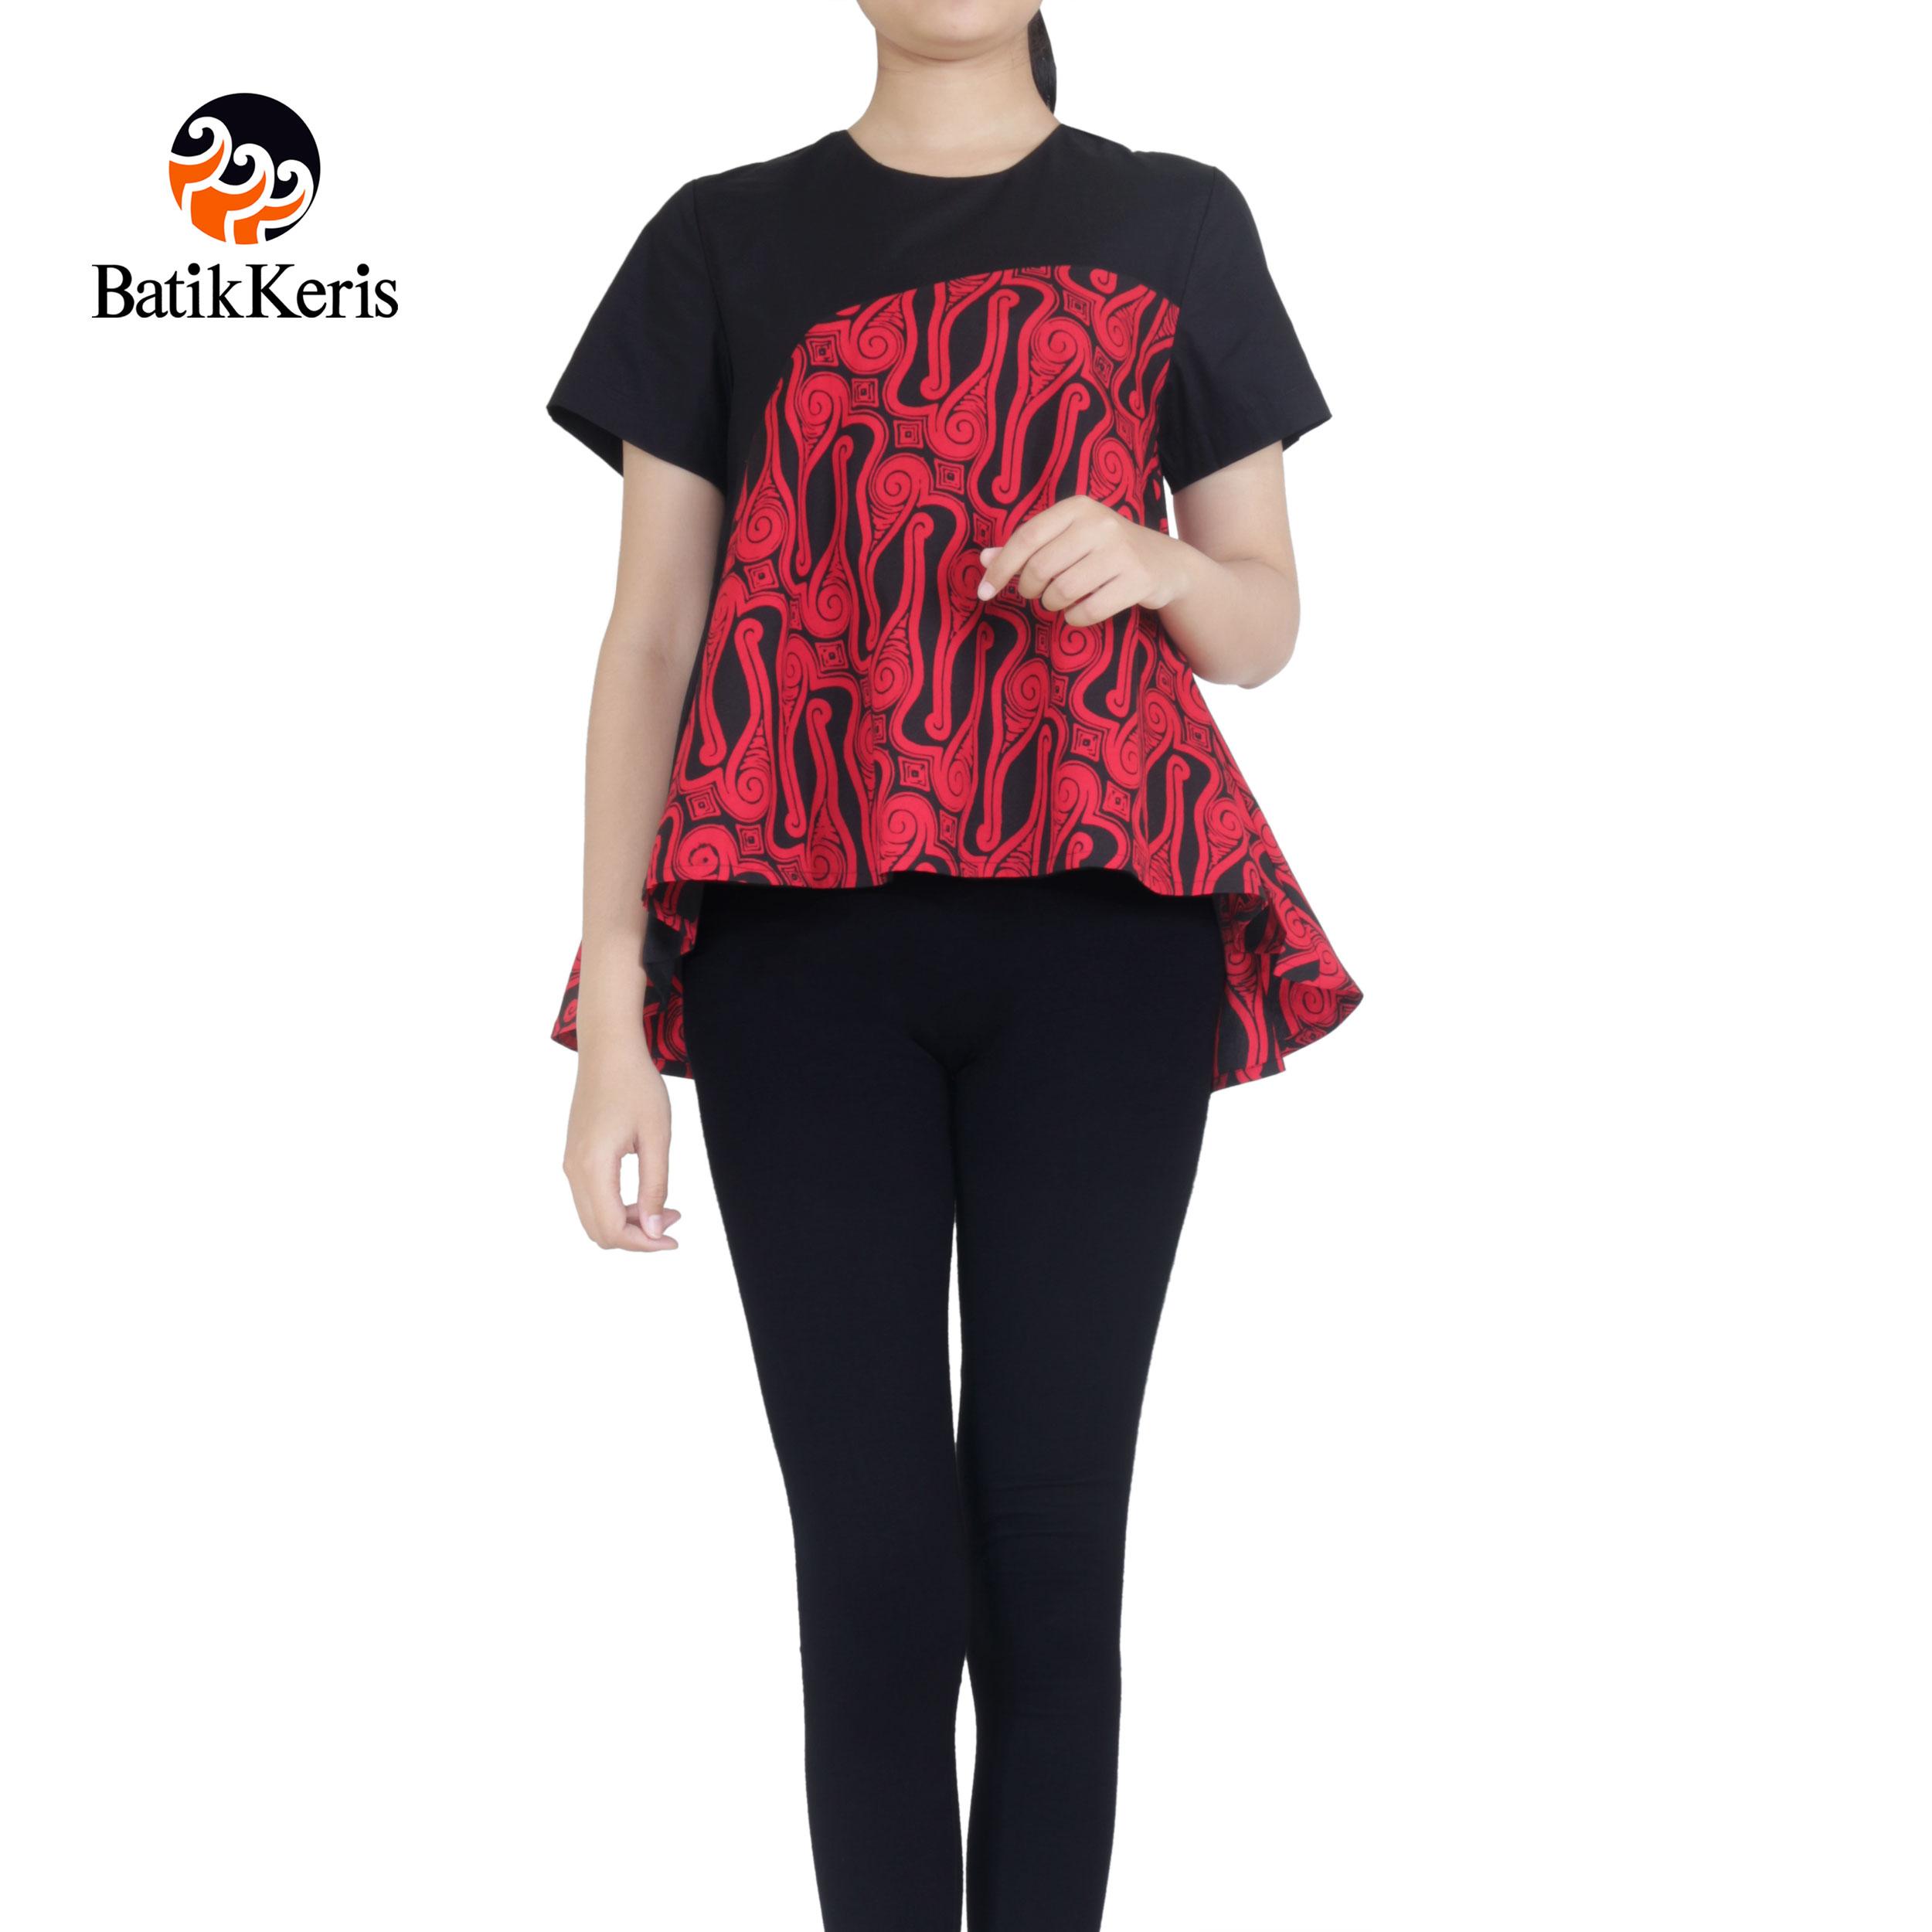 blouse lengan pendek motif parang tlale komb polos